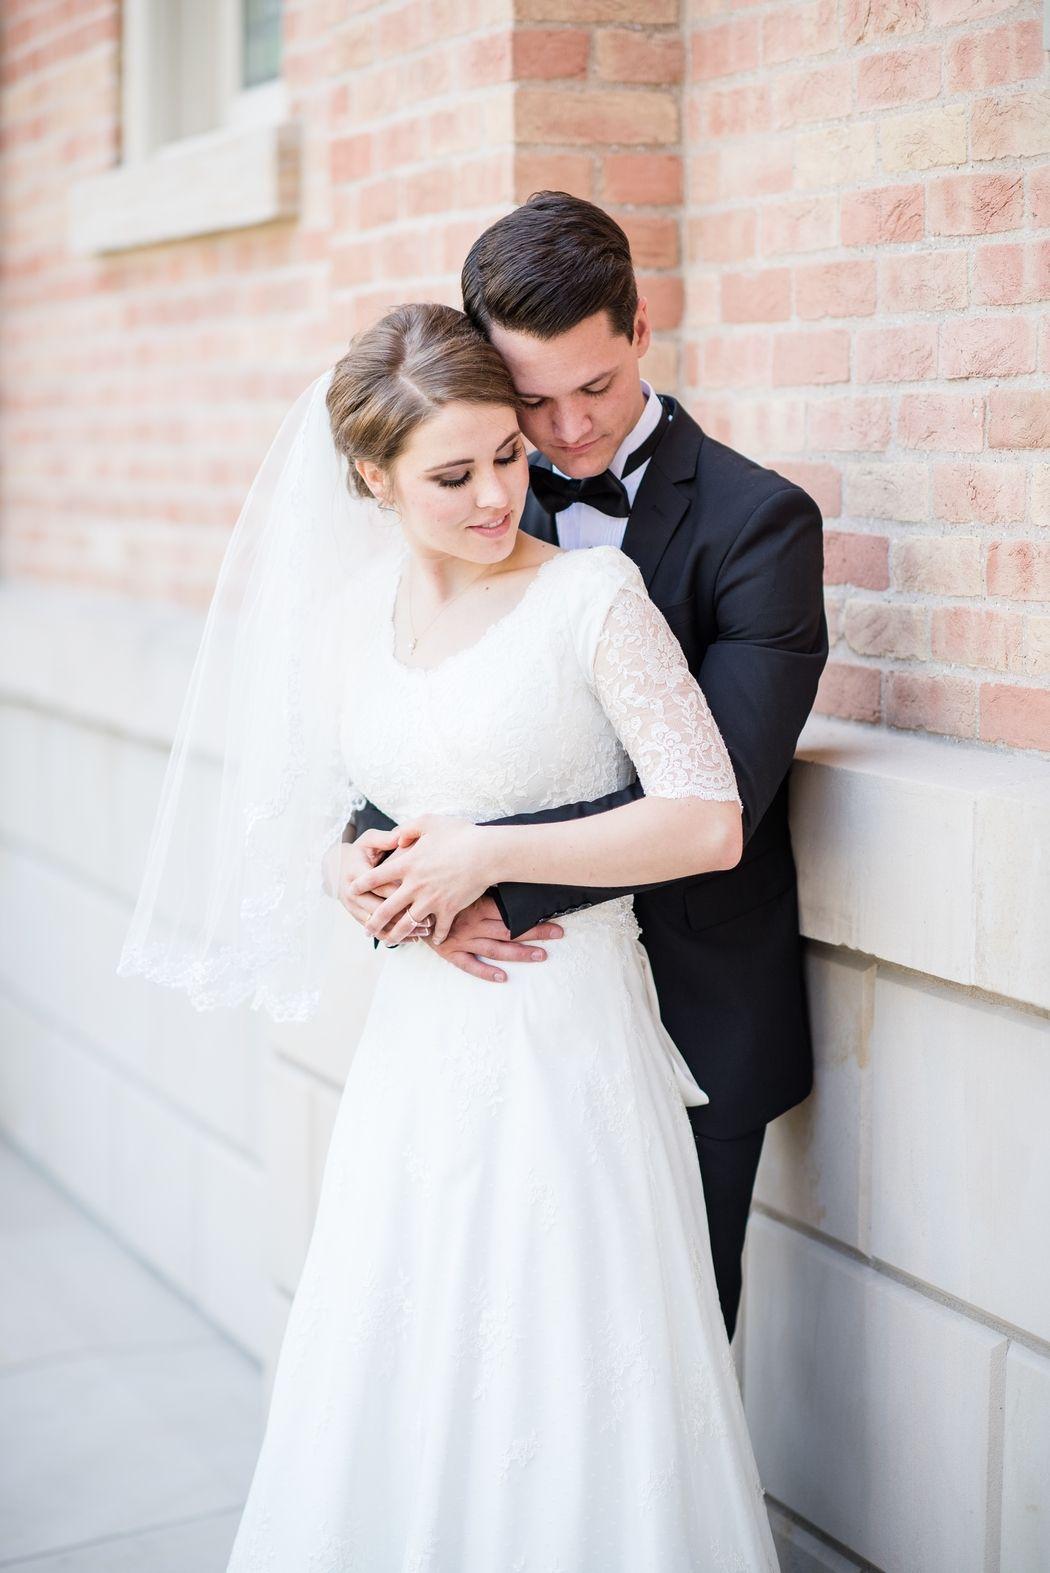 Provo City Center Temple LDS Wedding by Michelle & Logan | M & L ...